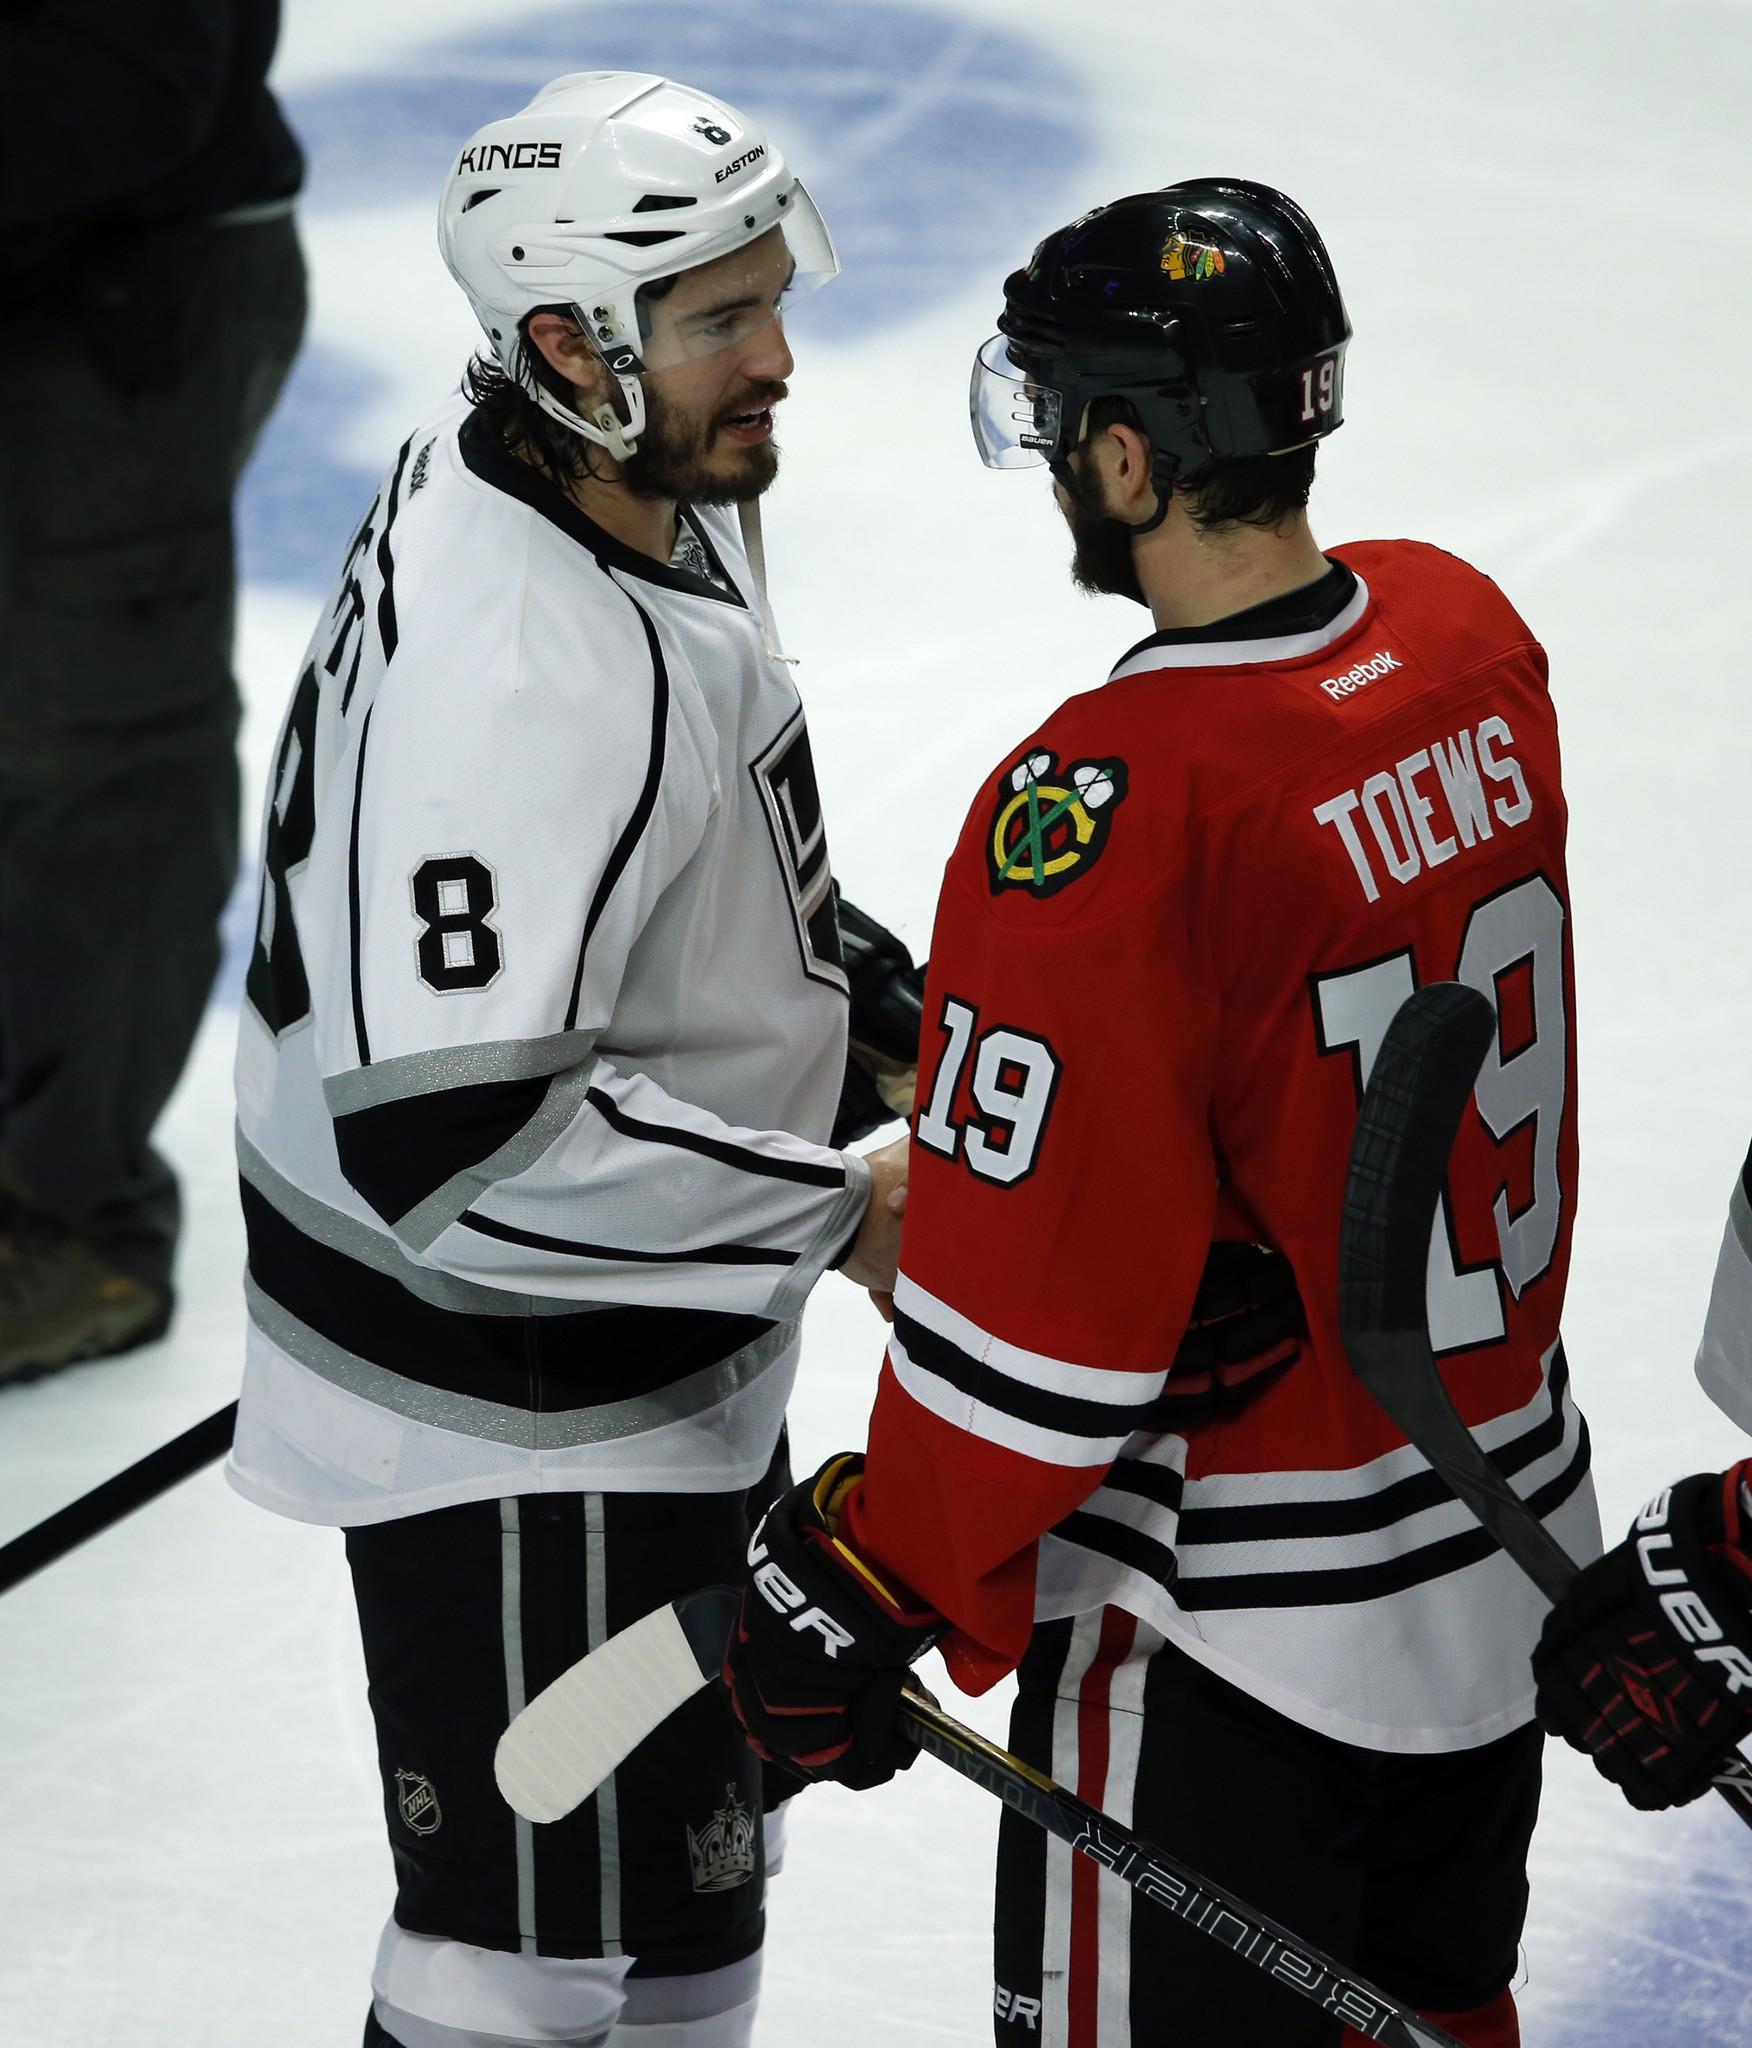 Blackhawks and Kings form mutual admiration society